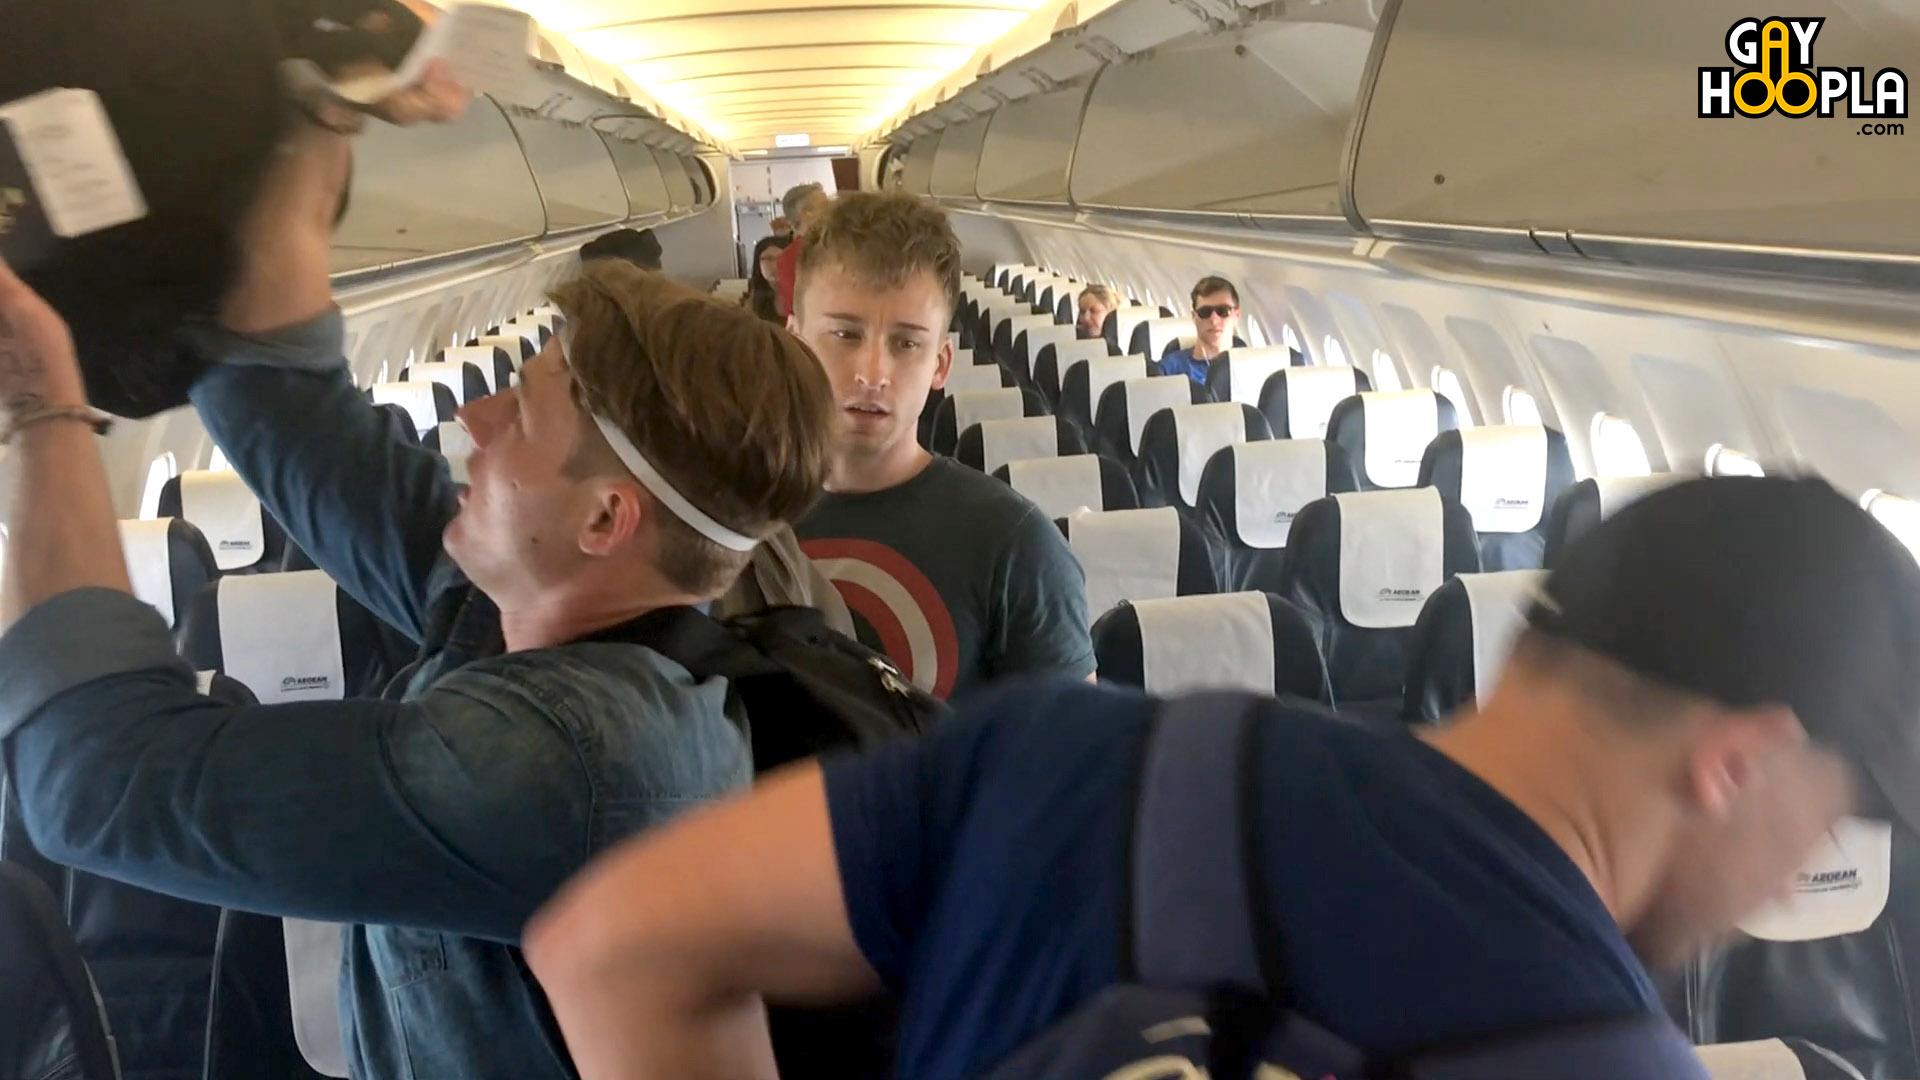 gayhoopla-price-hogan-airplane-12